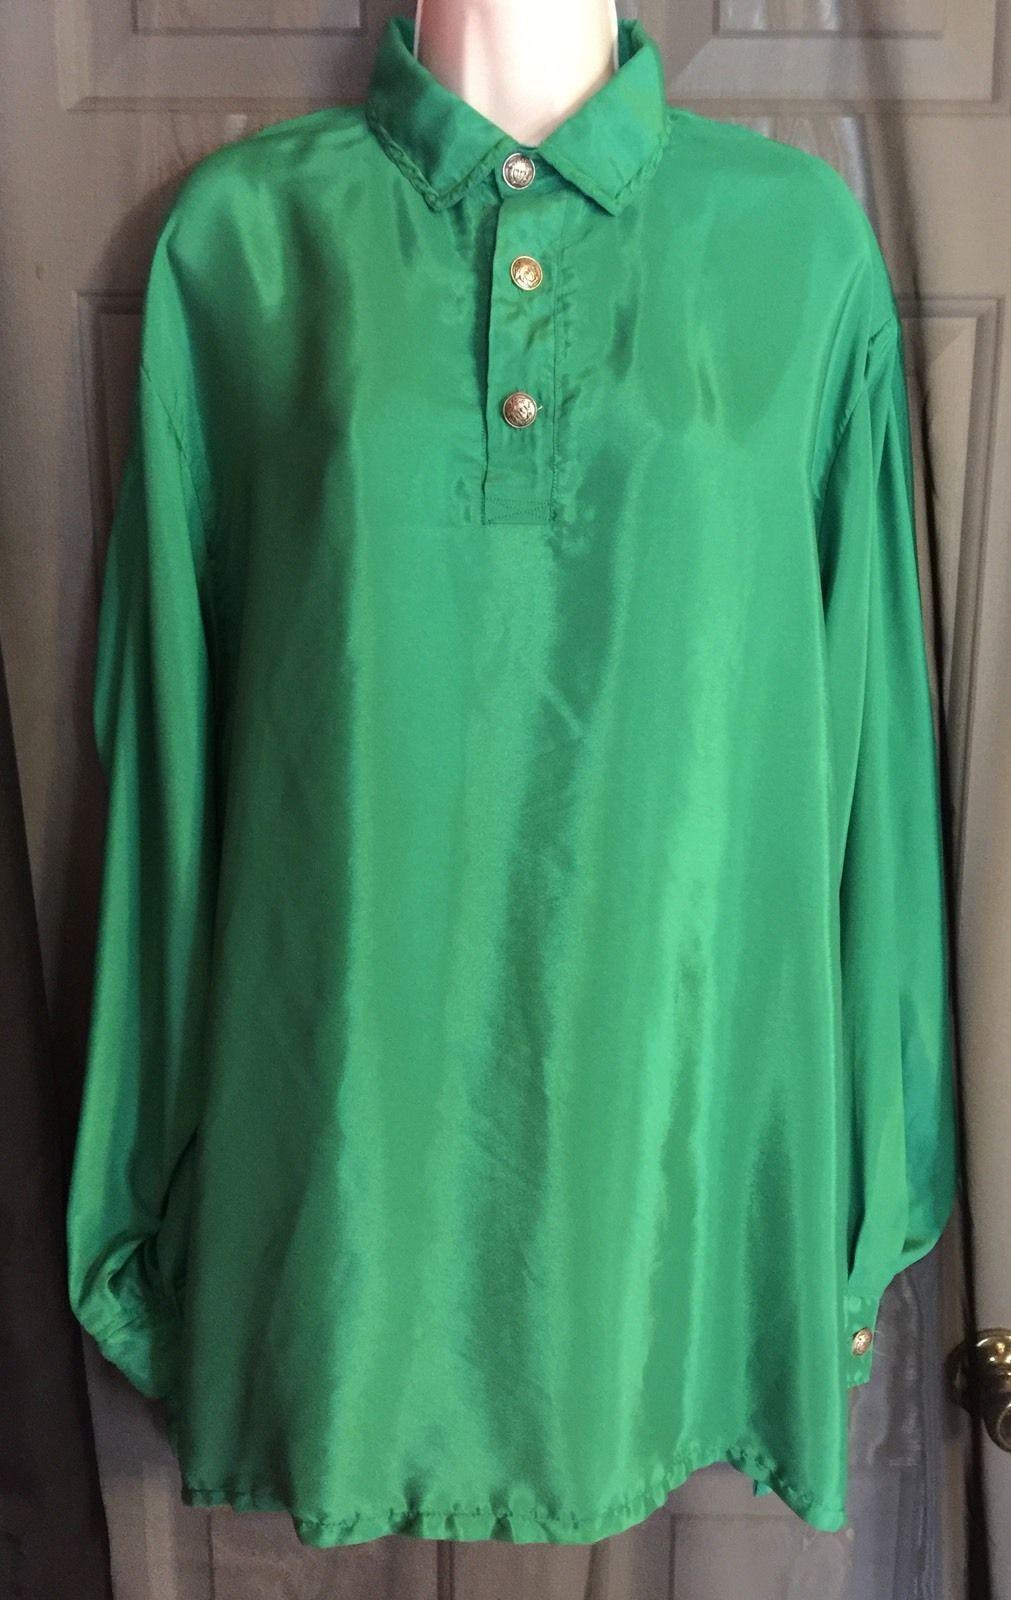 Vintage 90s Gianni Versace Green Couture 100 Silk Shirt Size 1x   eBay 1e84c29814d